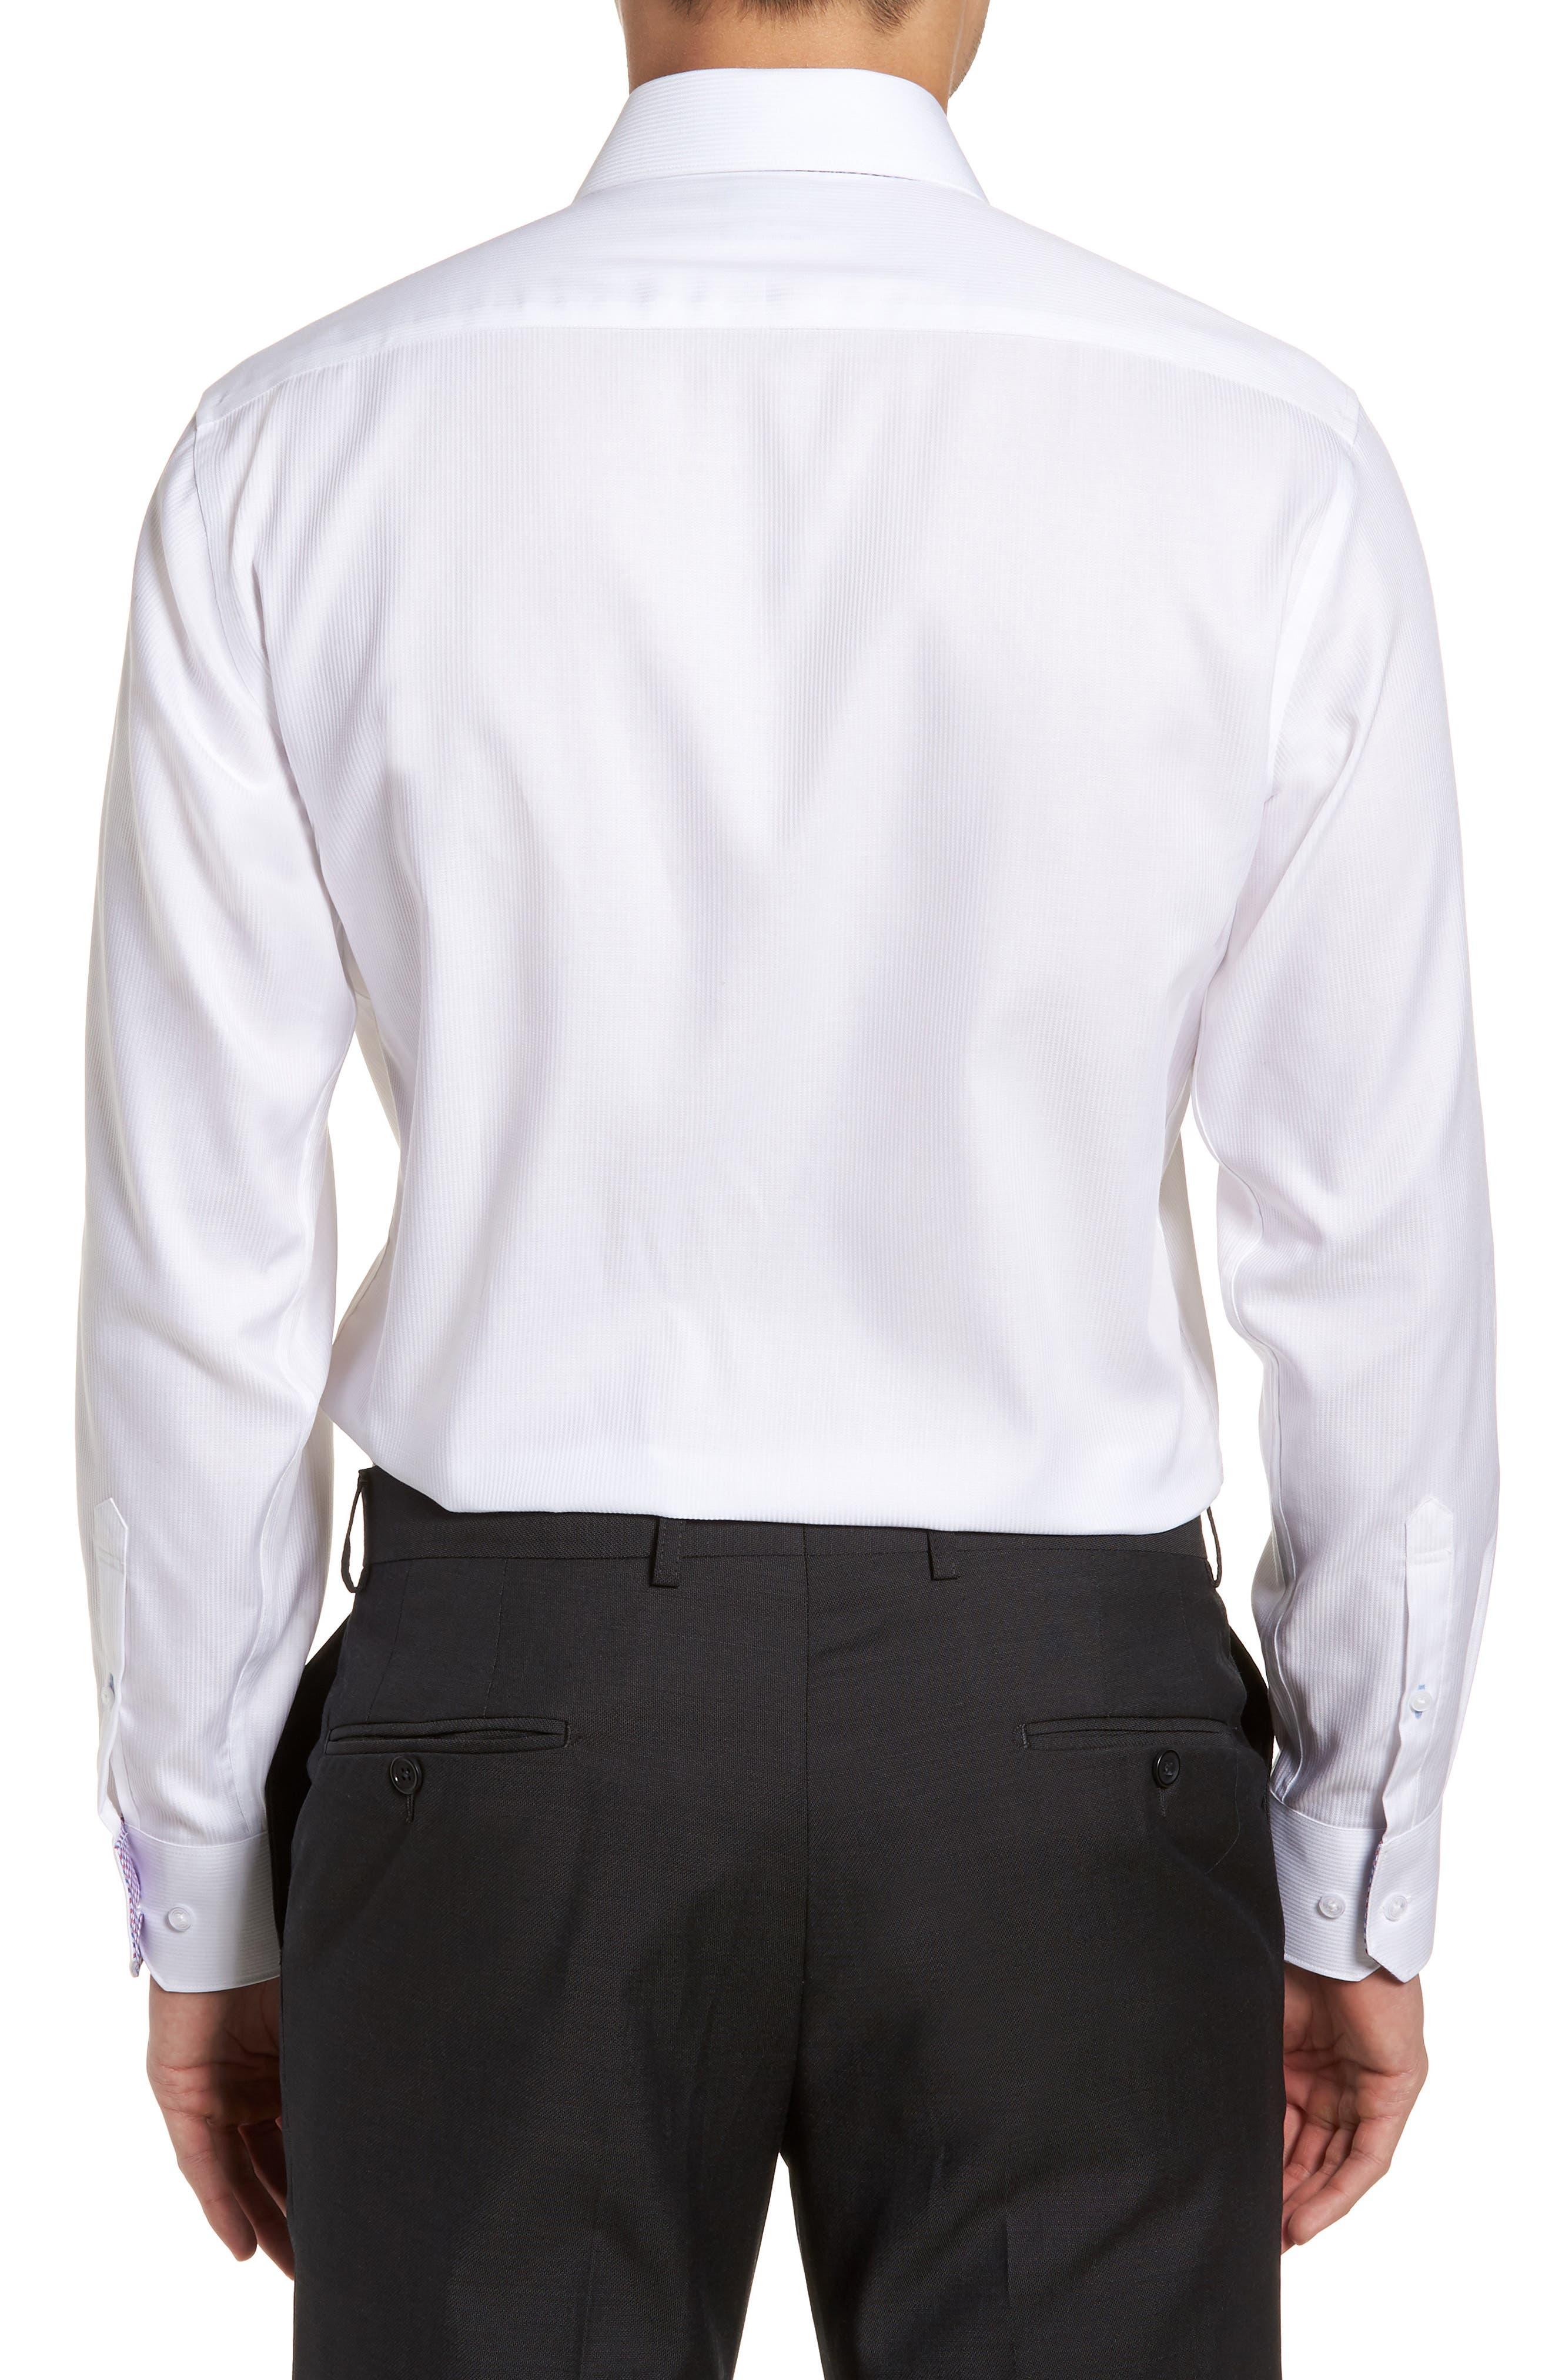 Becker Trim Fit Stripe Dress Shirt,                             Alternate thumbnail 3, color,                             White